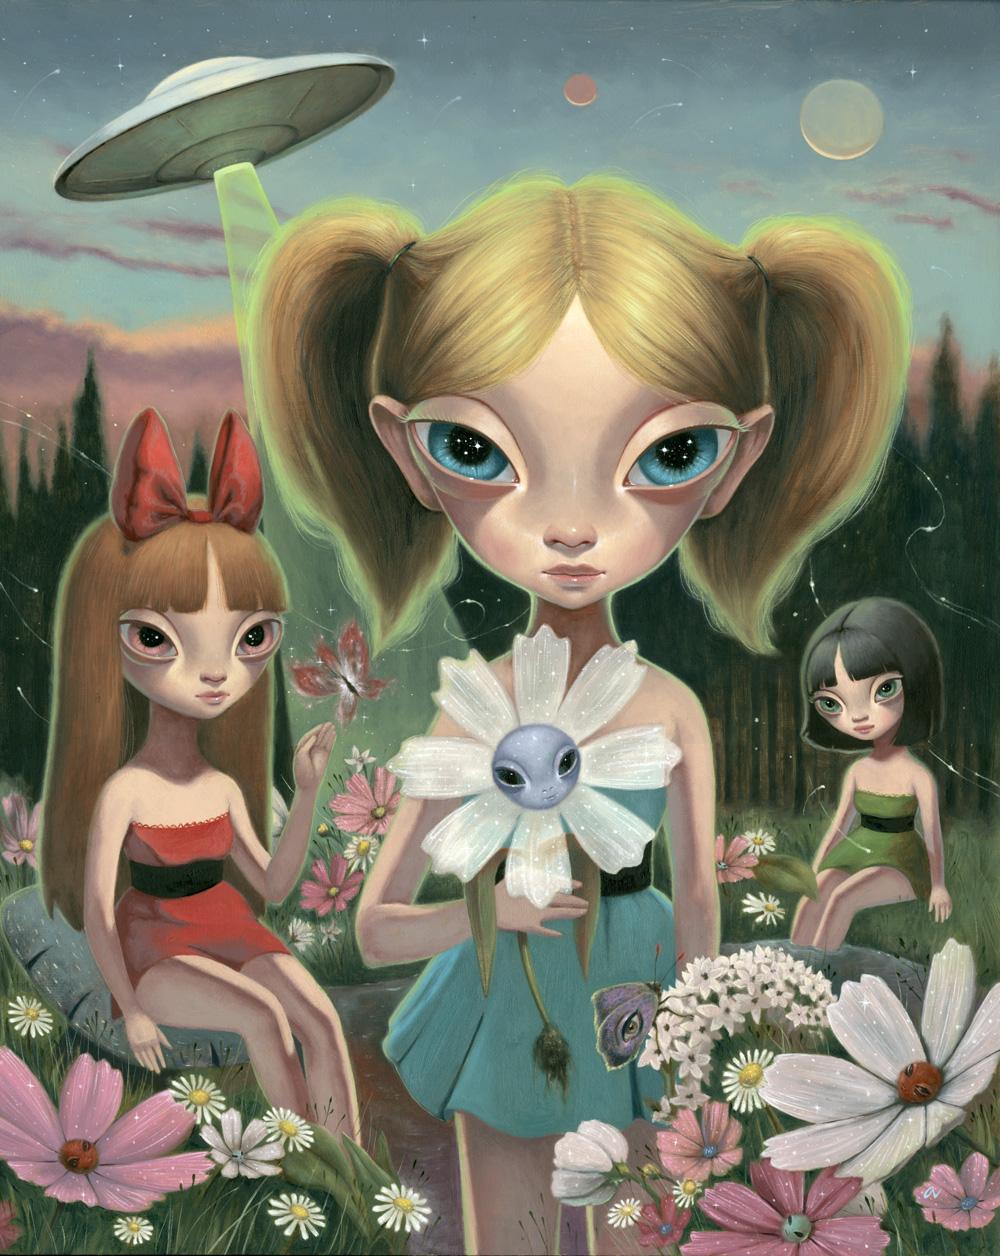 http://3.bp.blogspot.com/-DCRBnfoRteM/T-PNML-z8eI/AAAAAAAAHuE/XHDUPl9DD1U/s1600/planetofthefloraxians.jpg